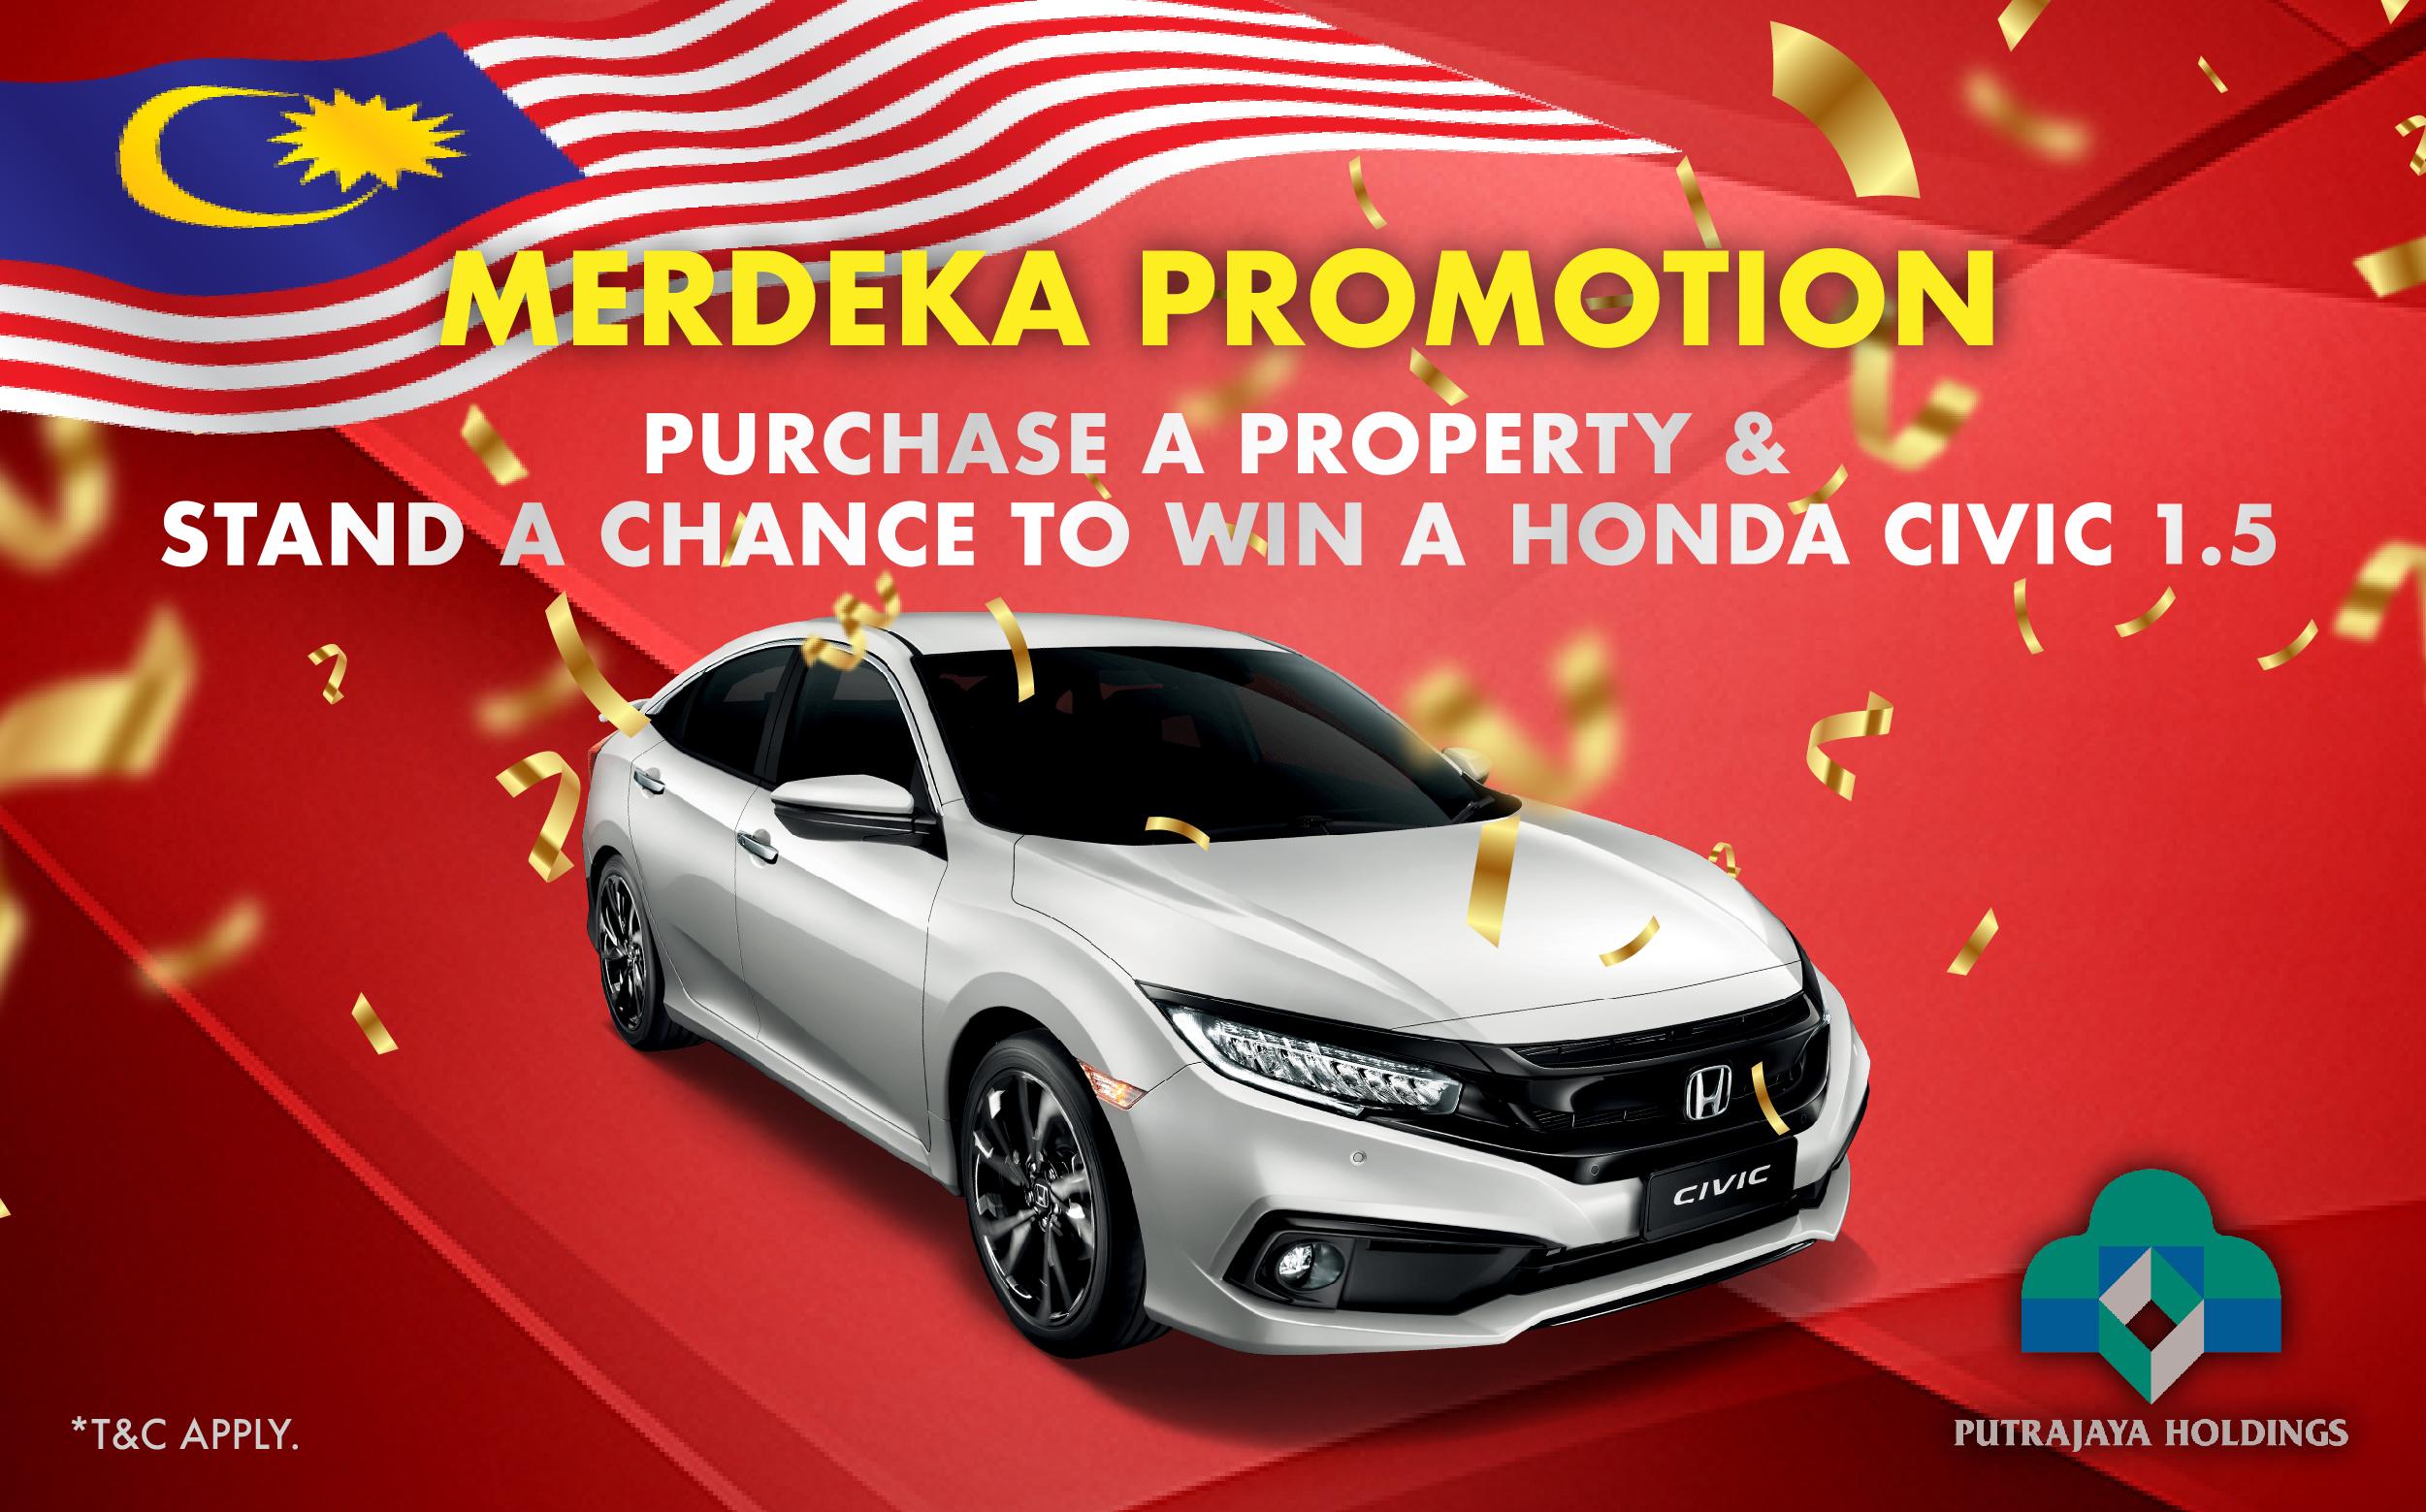 PjH Merdeka Promotion